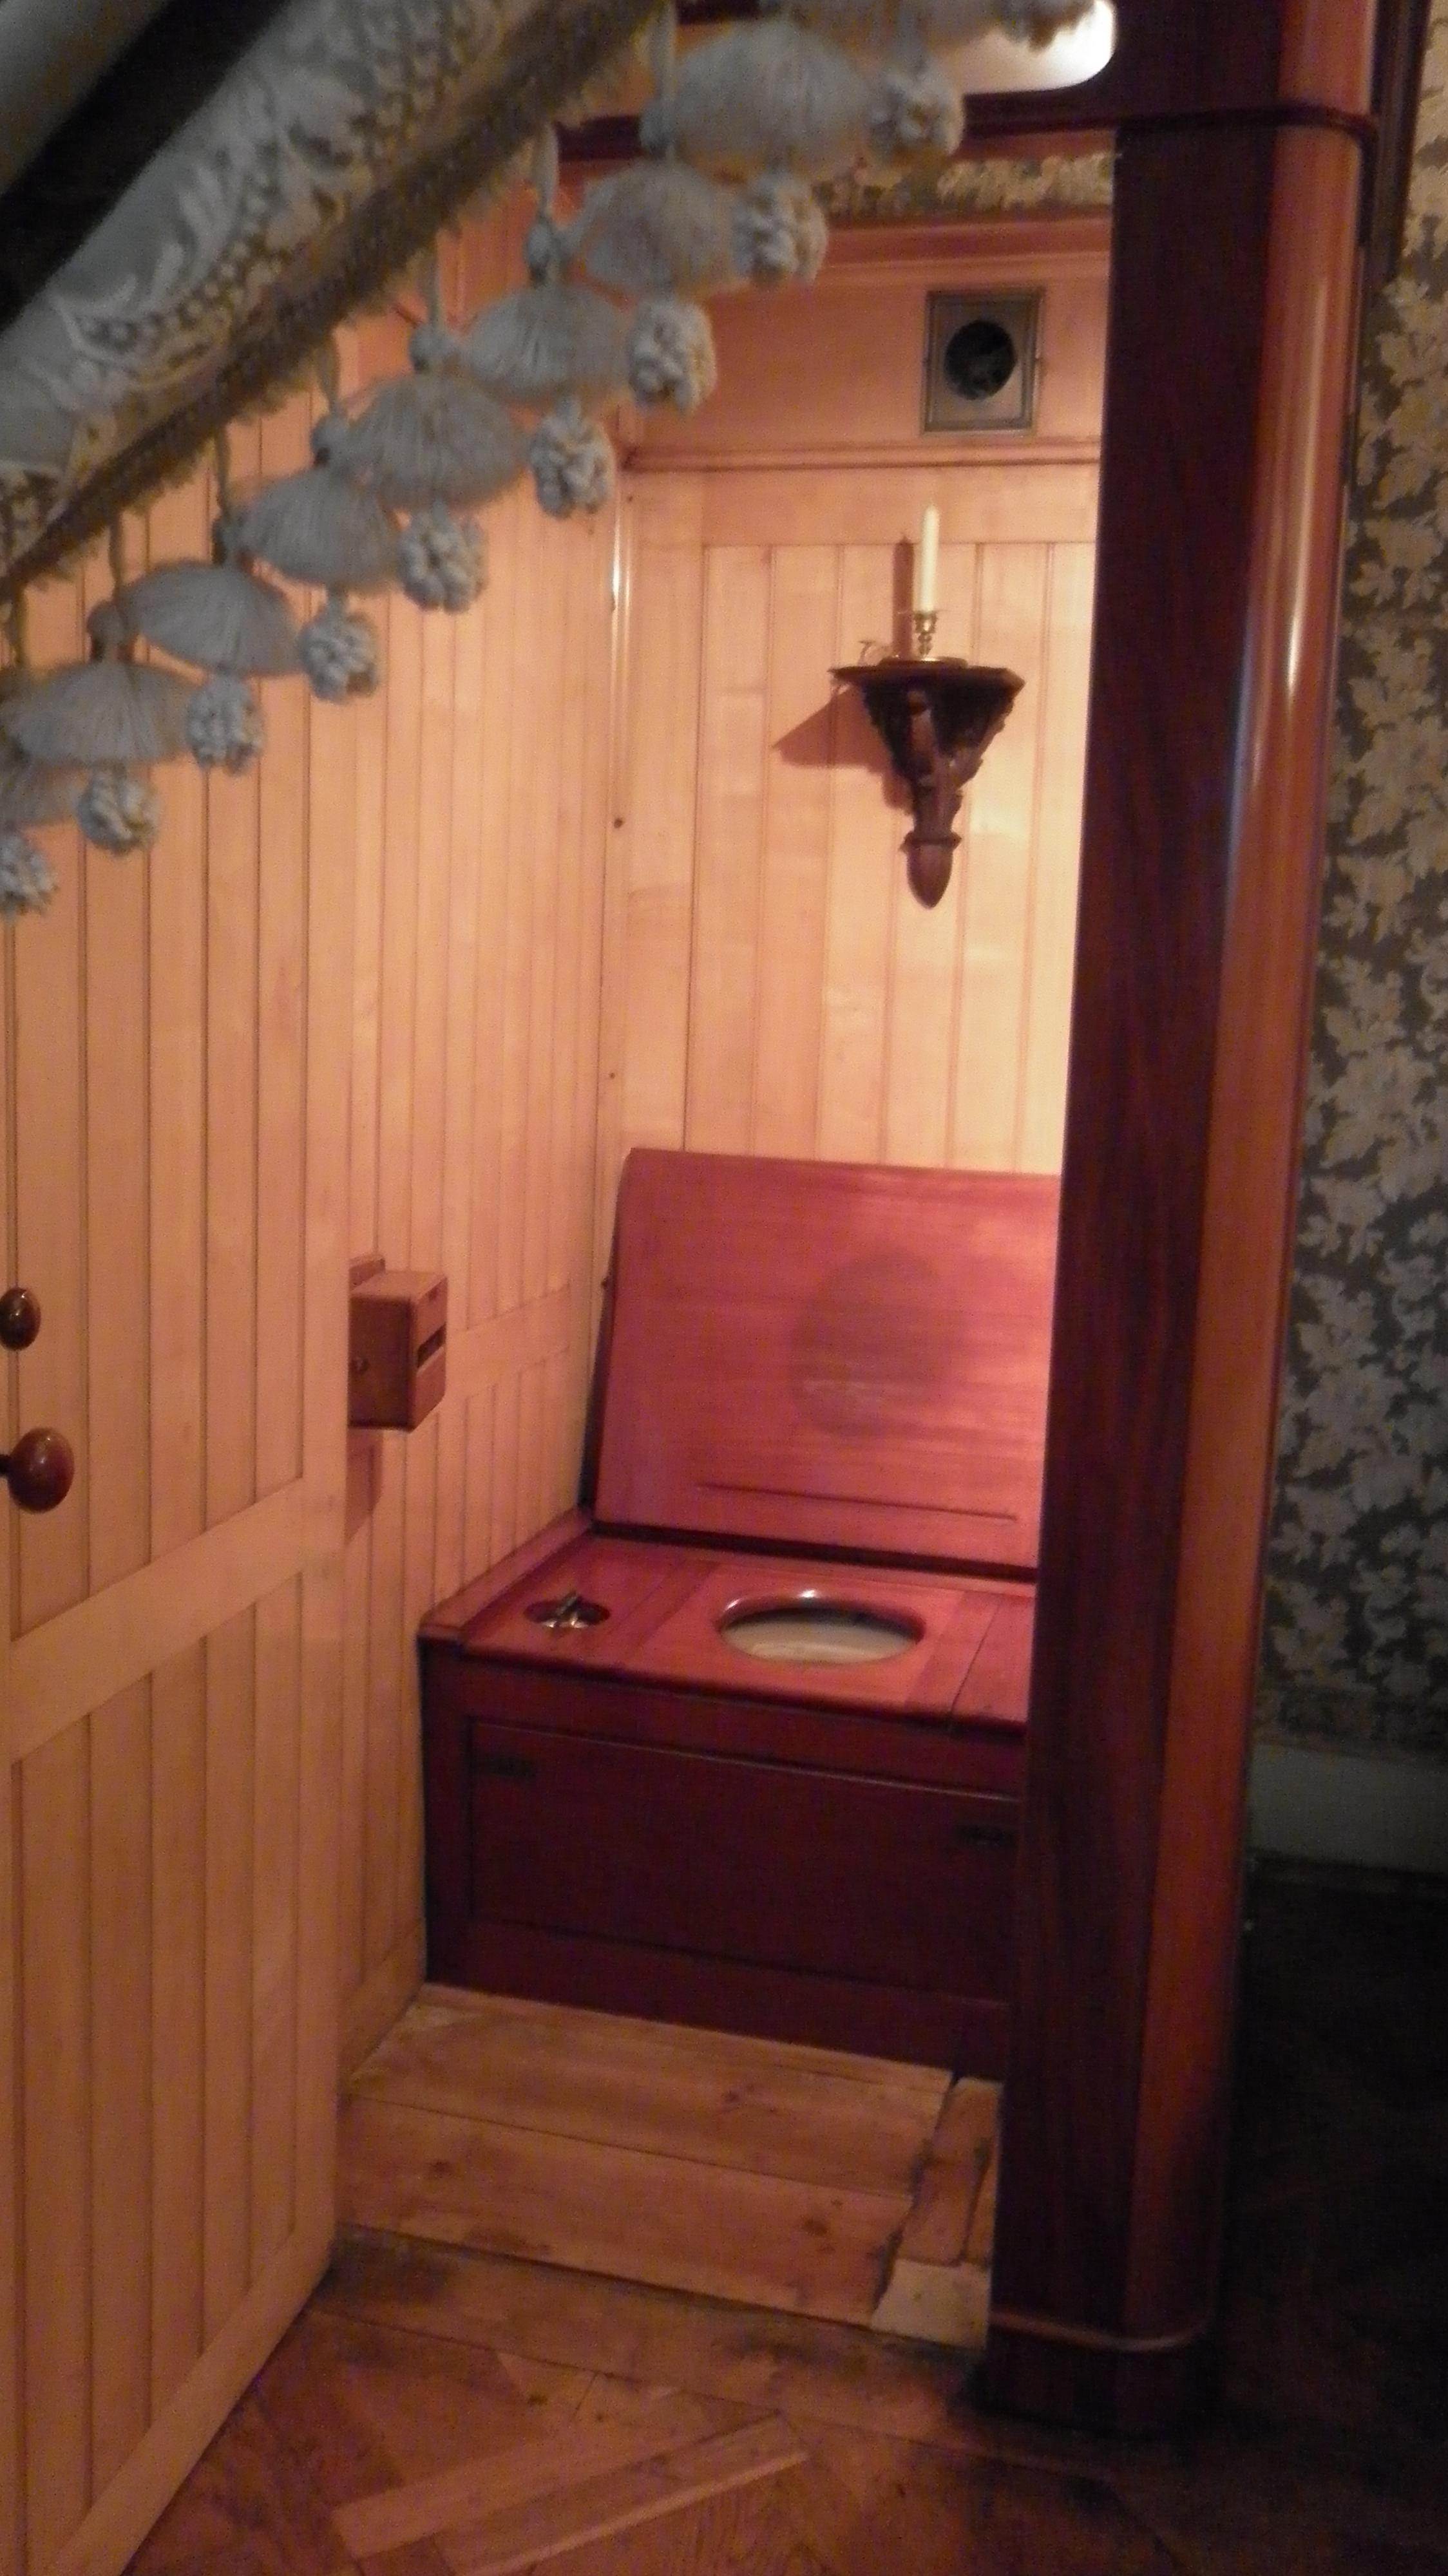 de coburg kronach site du coll ge g rard philipe niort. Black Bedroom Furniture Sets. Home Design Ideas